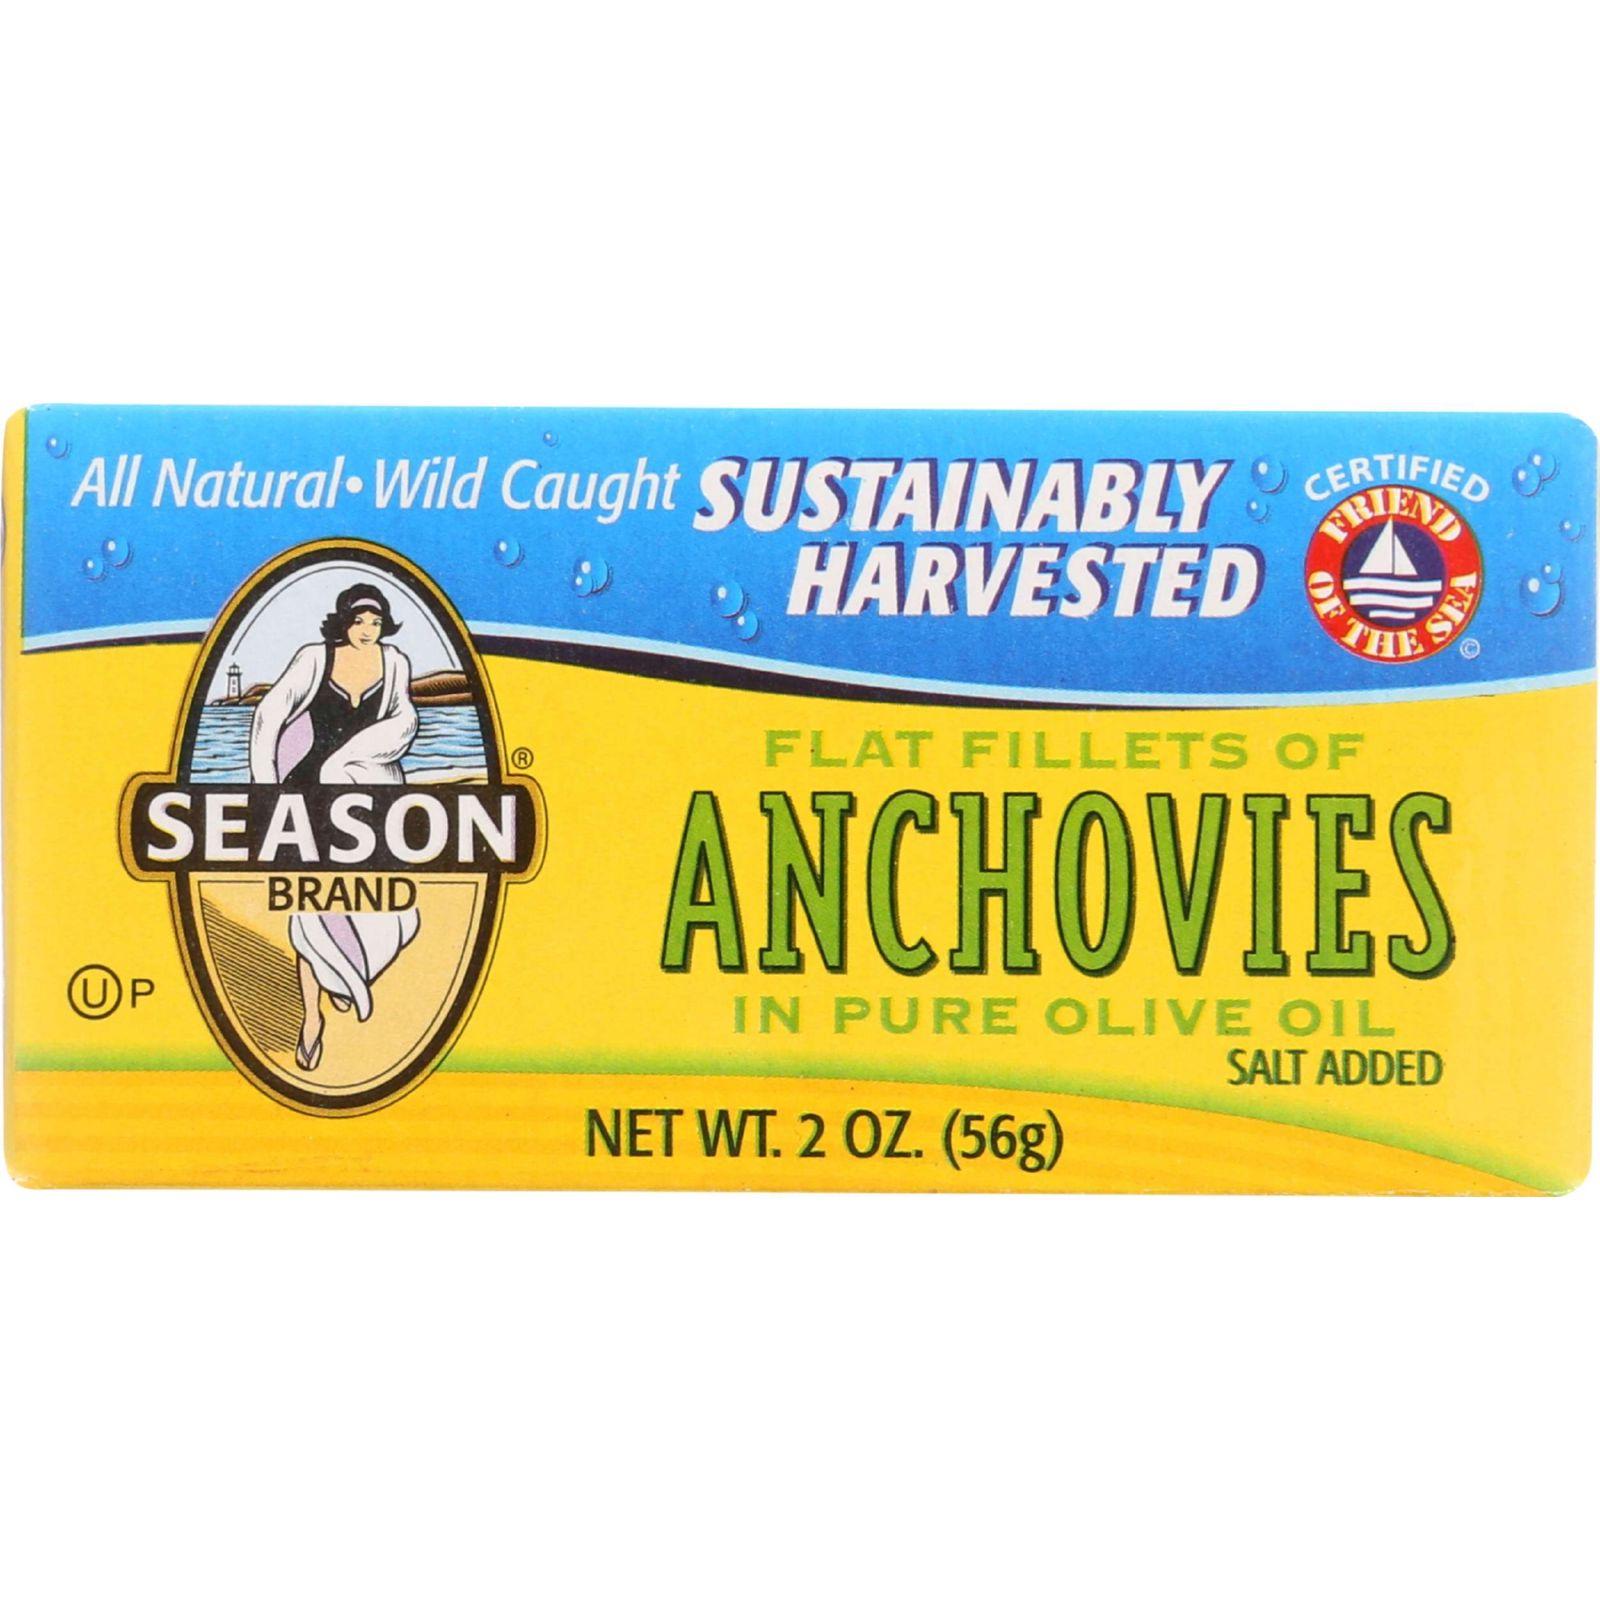 Season Brand Anchovies - Flat Fillets - Salt Added - 2 Oz - Case Of 25